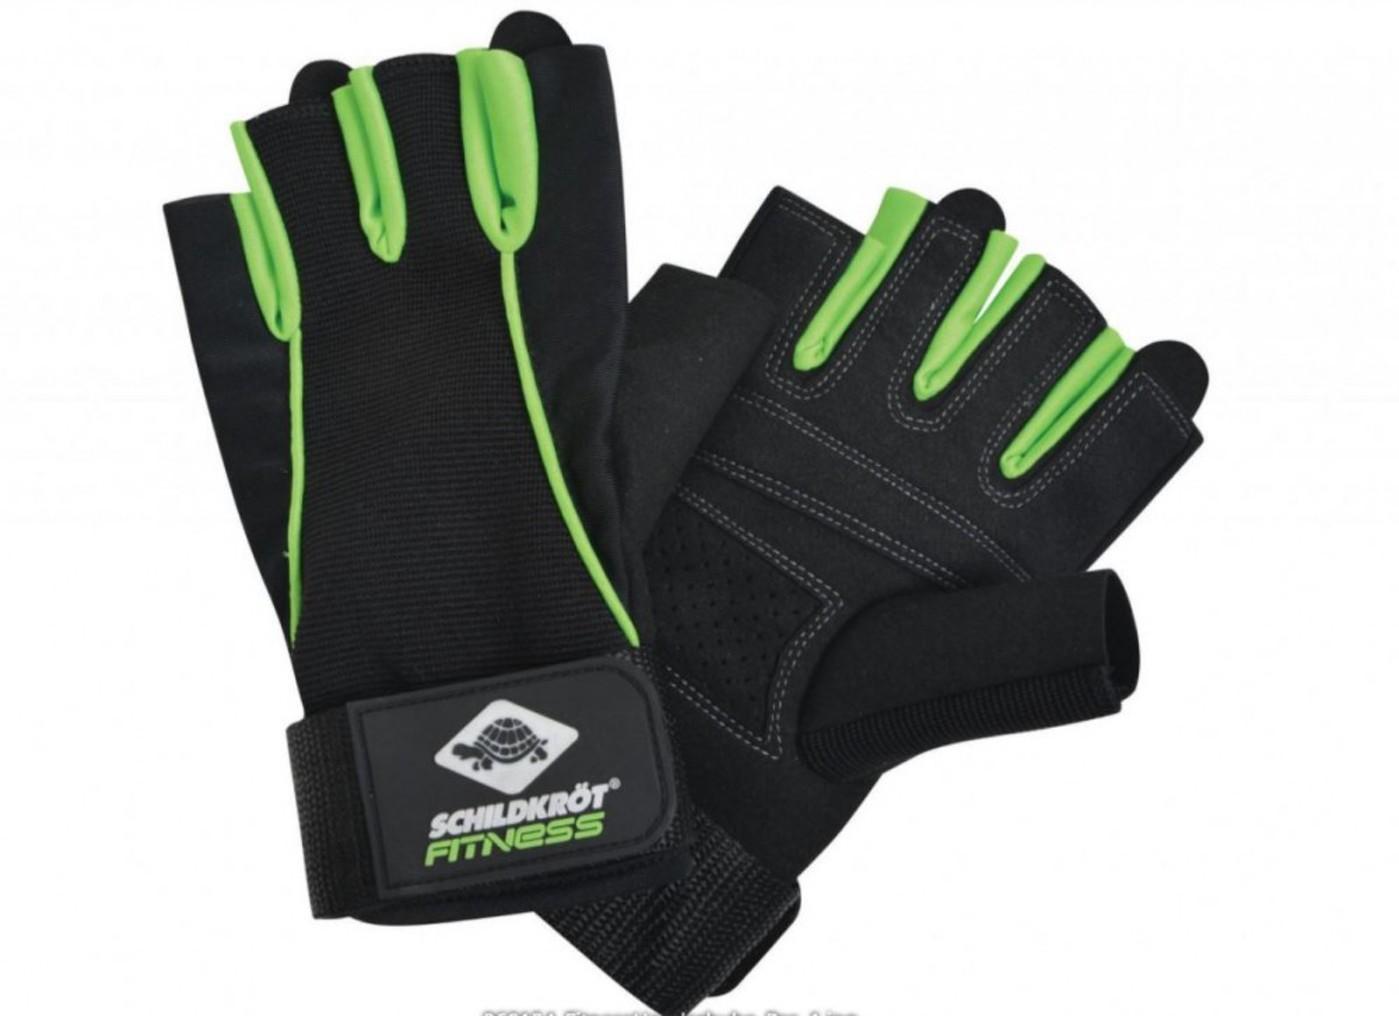 SCHILDKRÖT Fitness-Handschuhe Pro